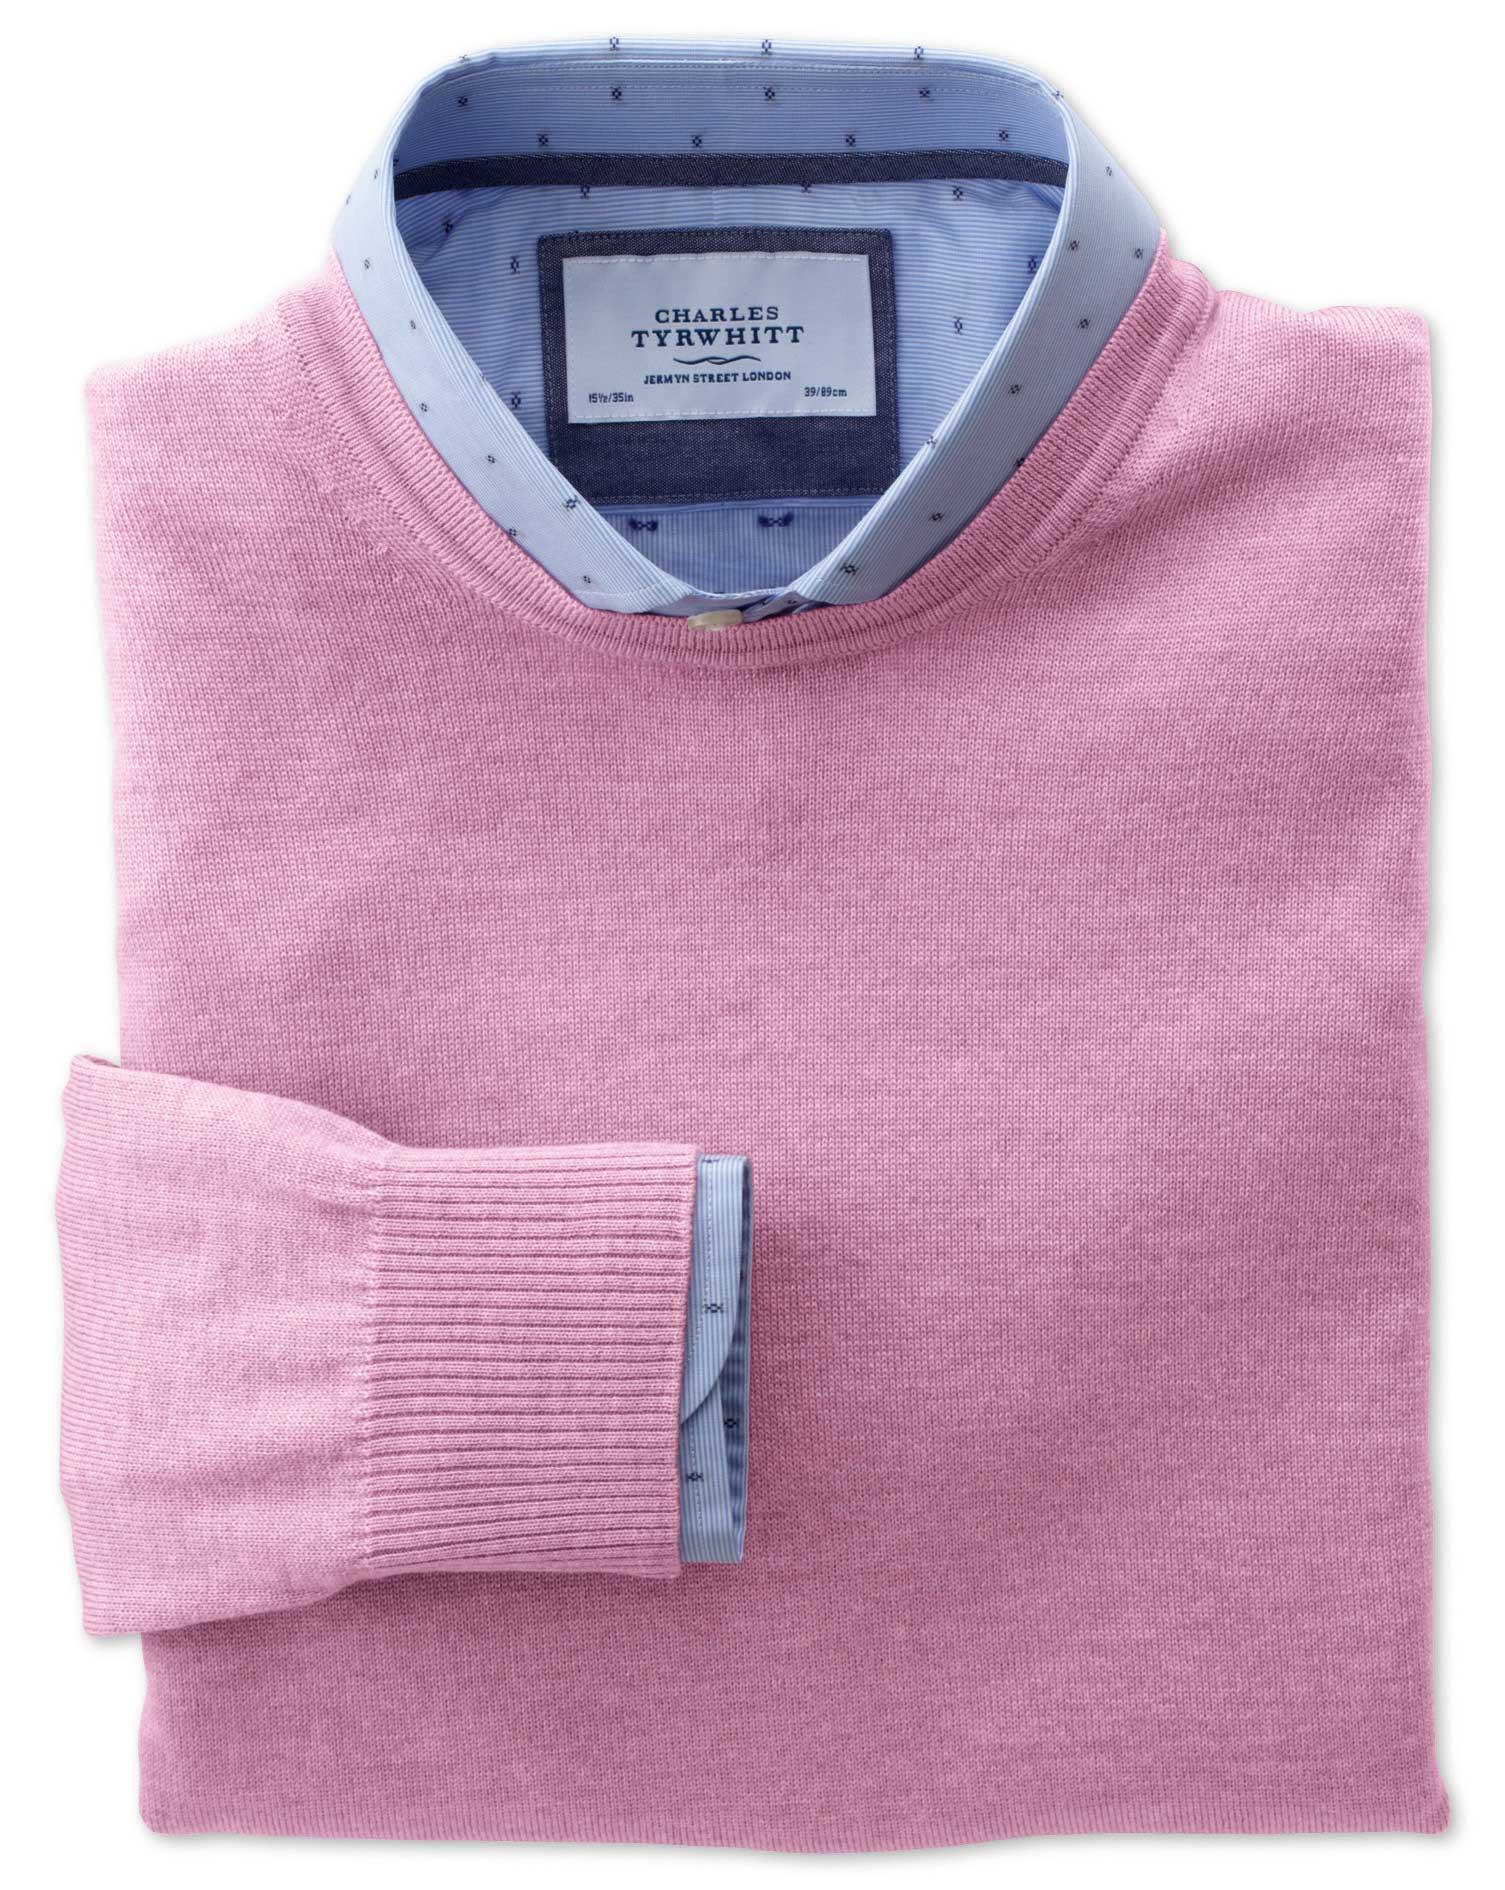 Light Pink Merino Wool Crew Neck Jumper Size Medium by Charles Tyrwhitt